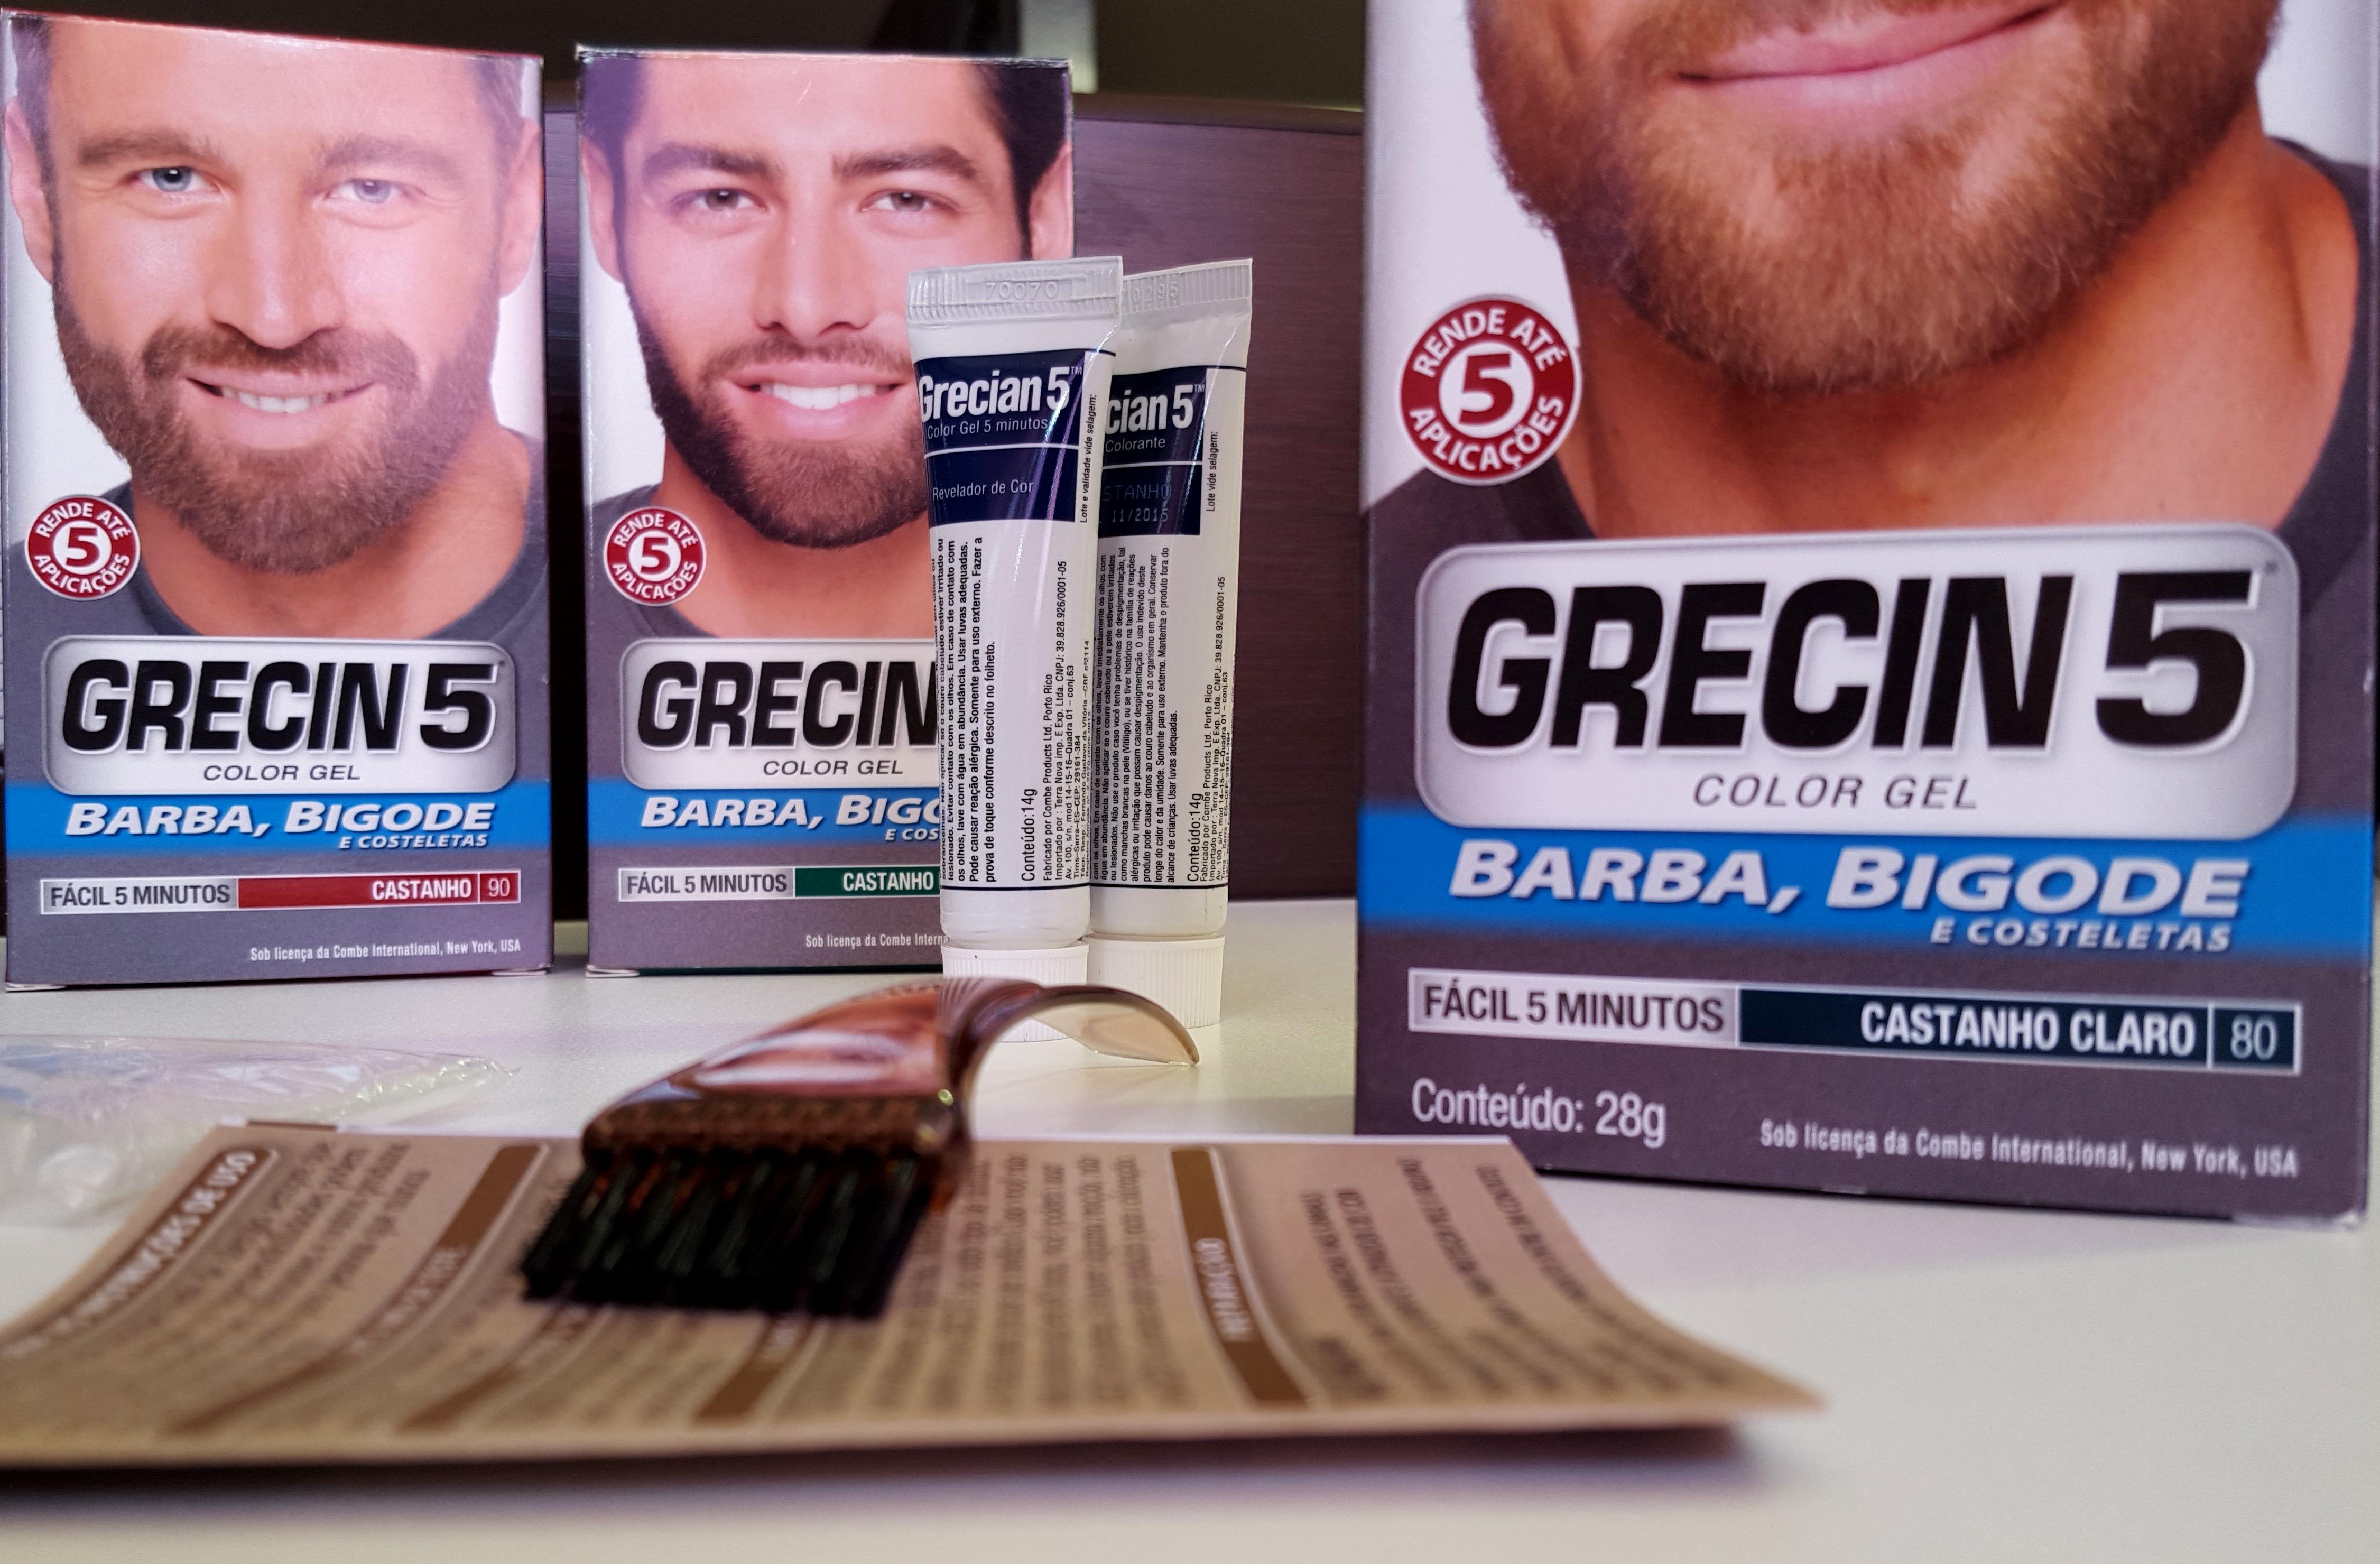 Grecin Barba